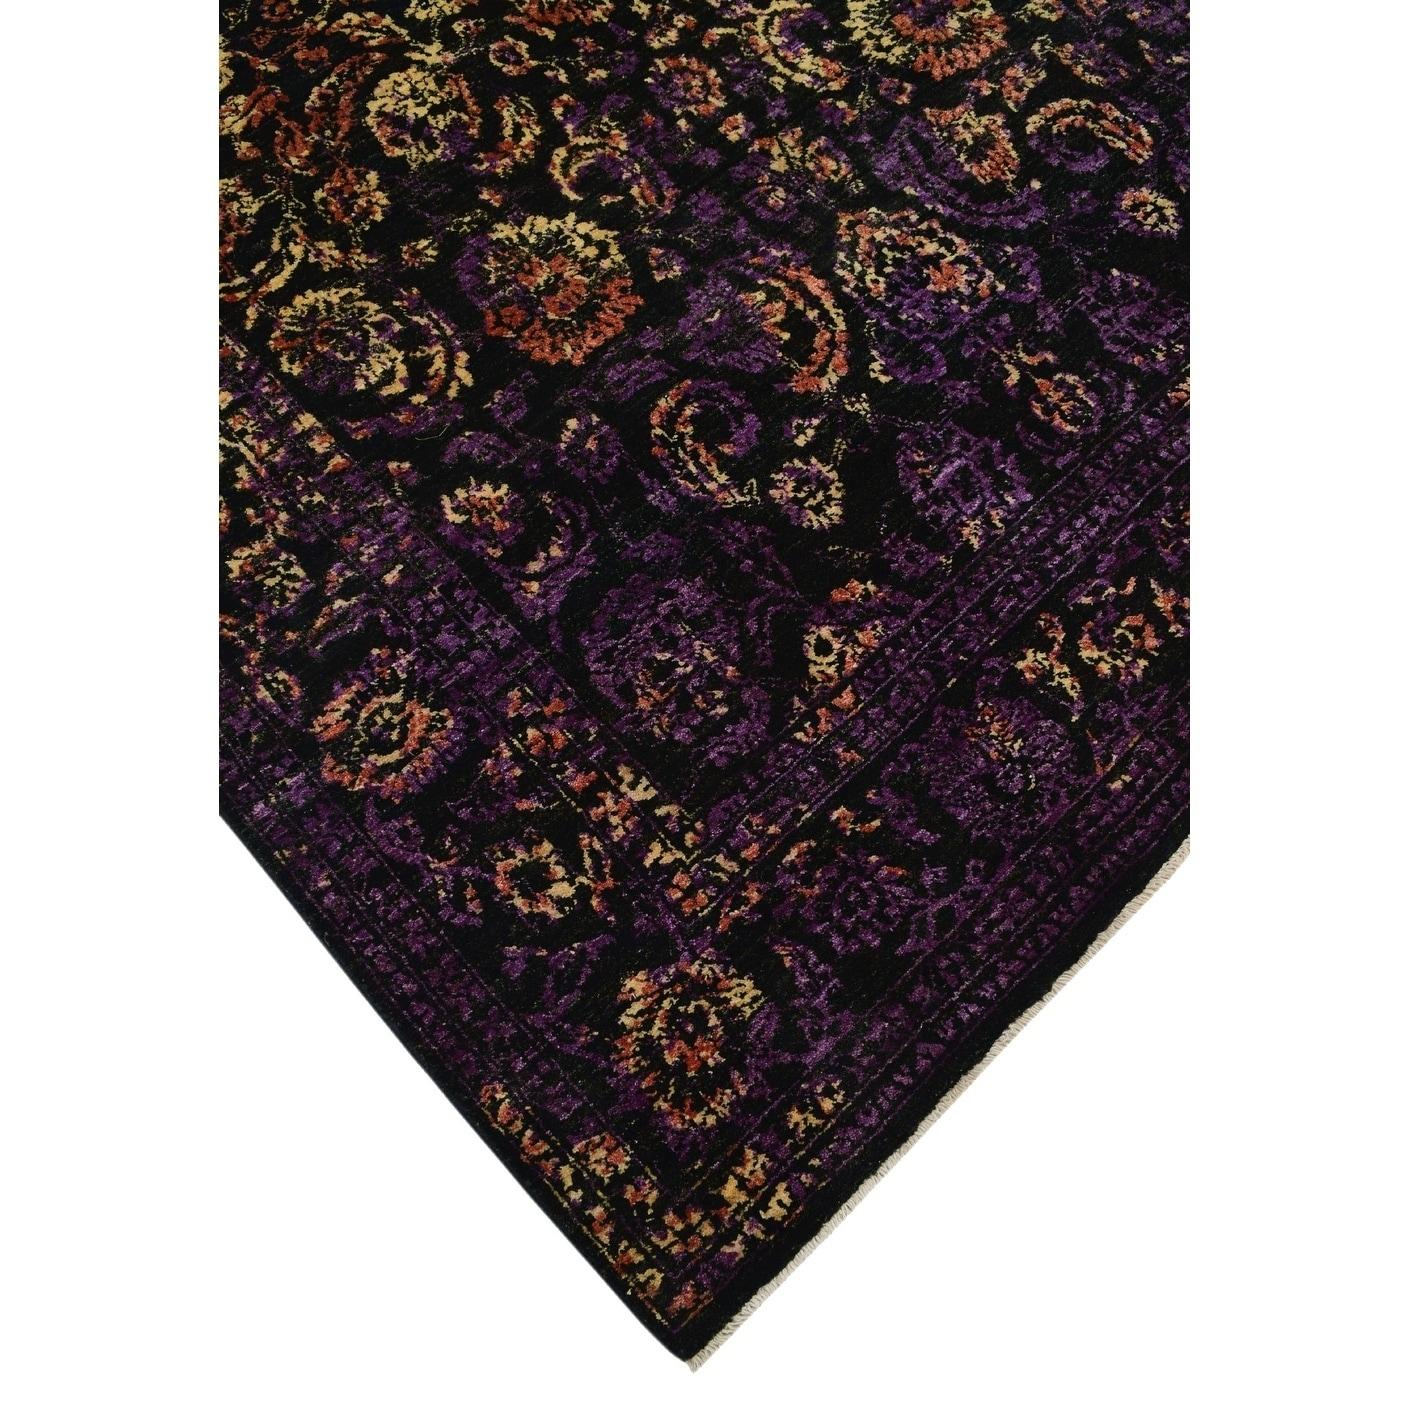 Noori Rug Aria Fine Chobi Juniper Black Purple 6 2 X 9 4 Free Shipping Today 24305057